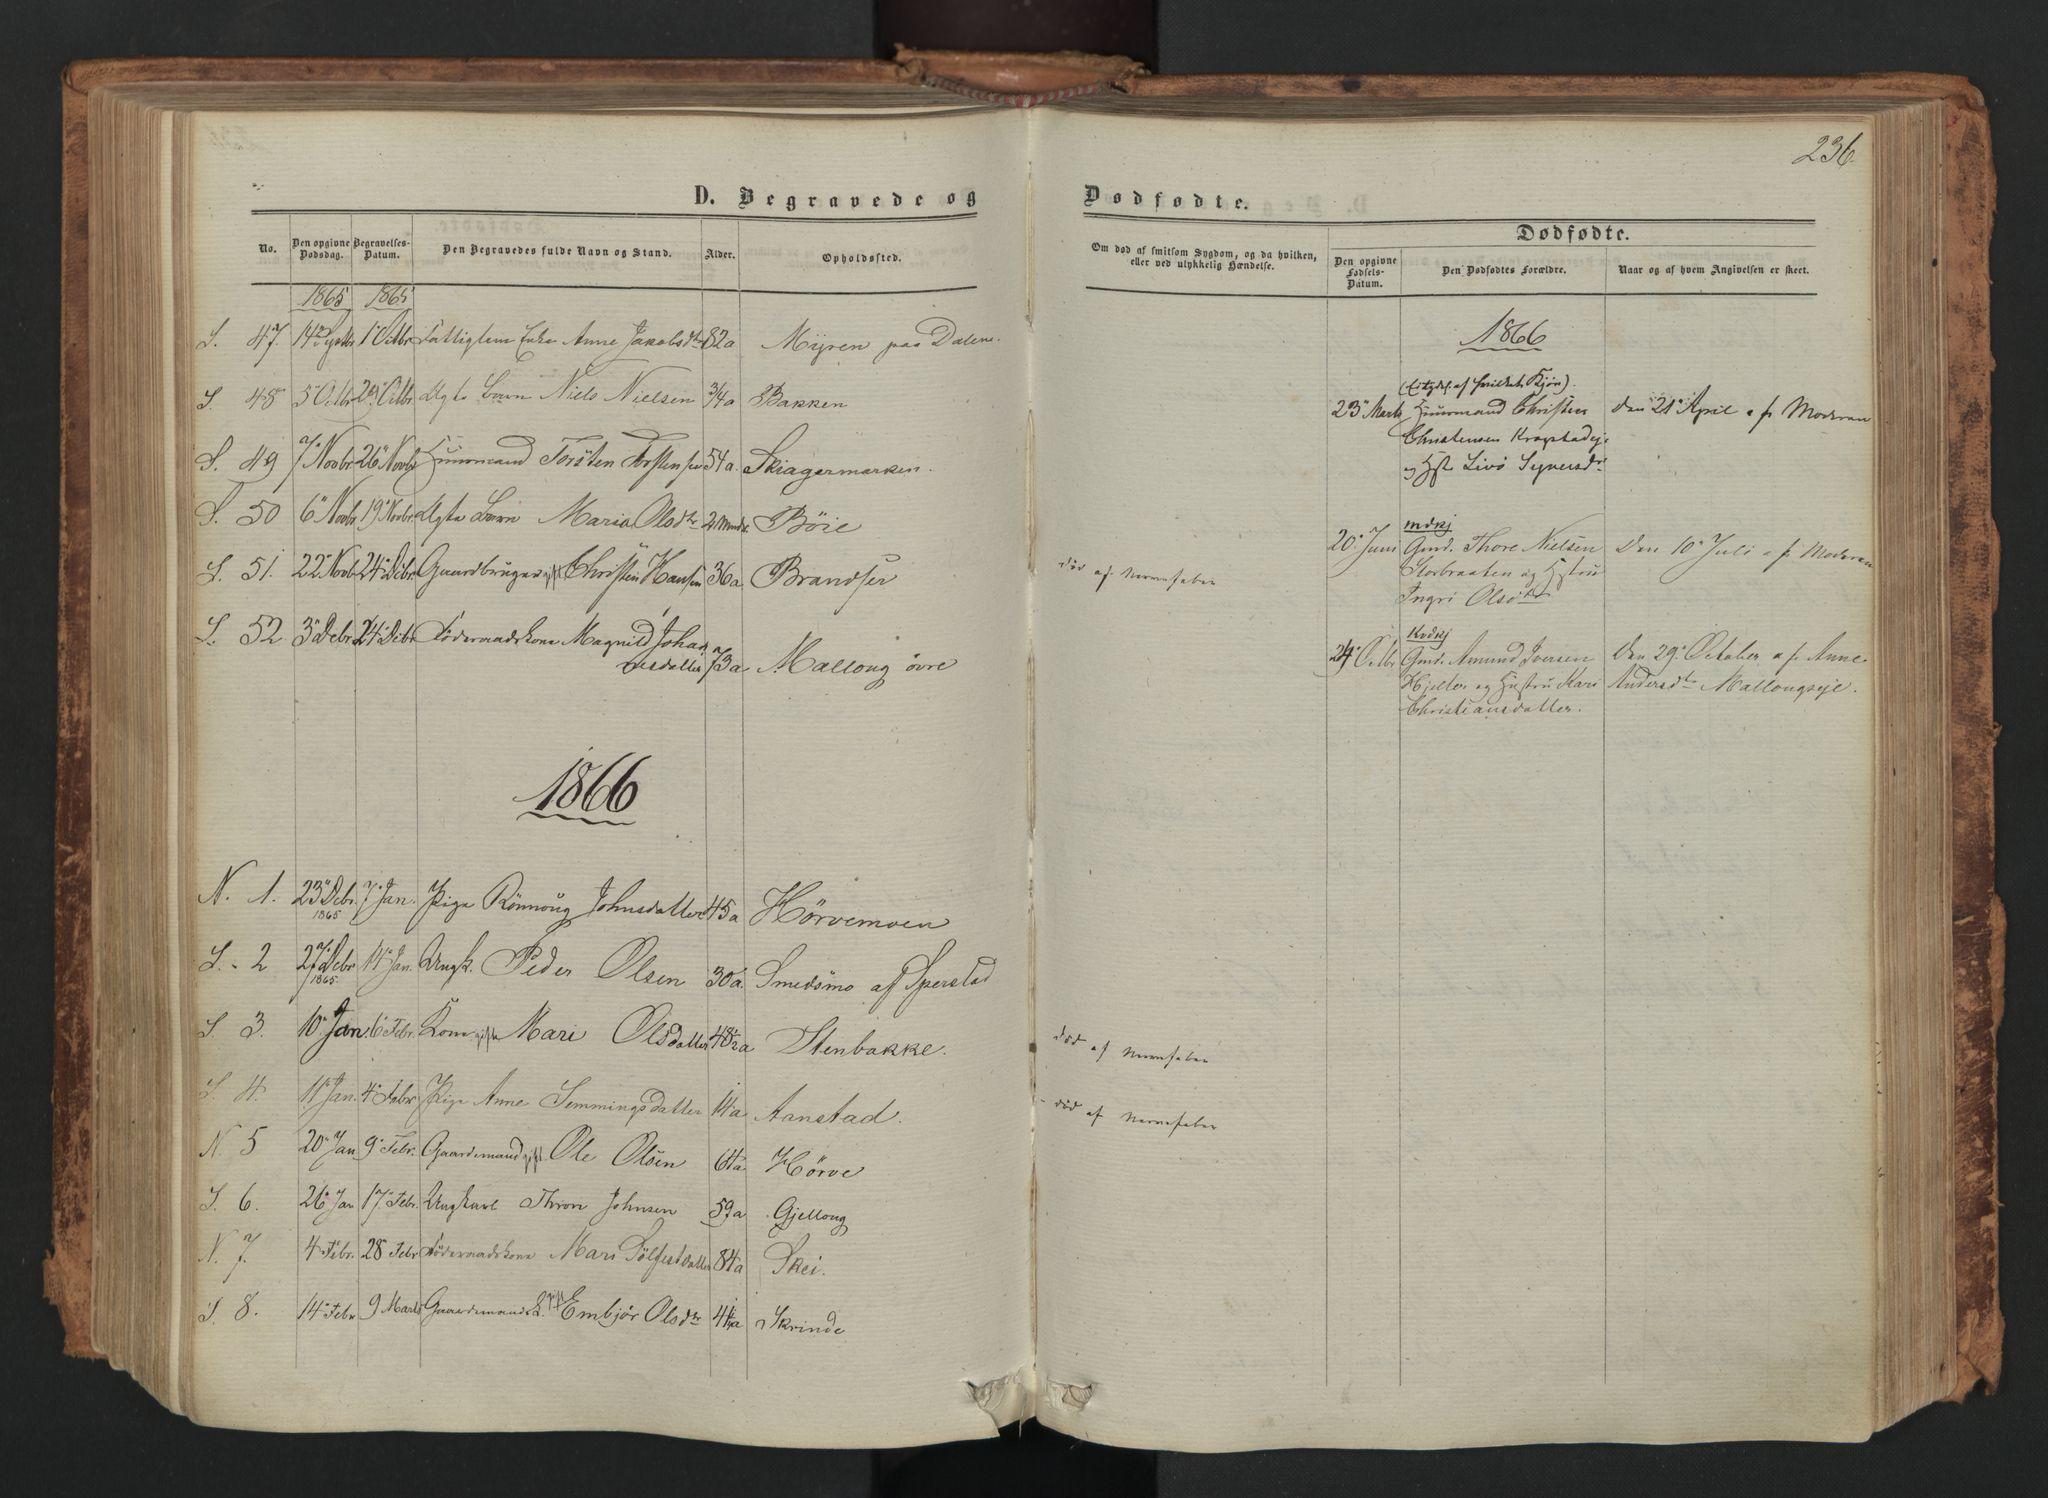 SAH, Skjåk prestekontor, Ministerialbok nr. 1, 1863-1879, s. 236